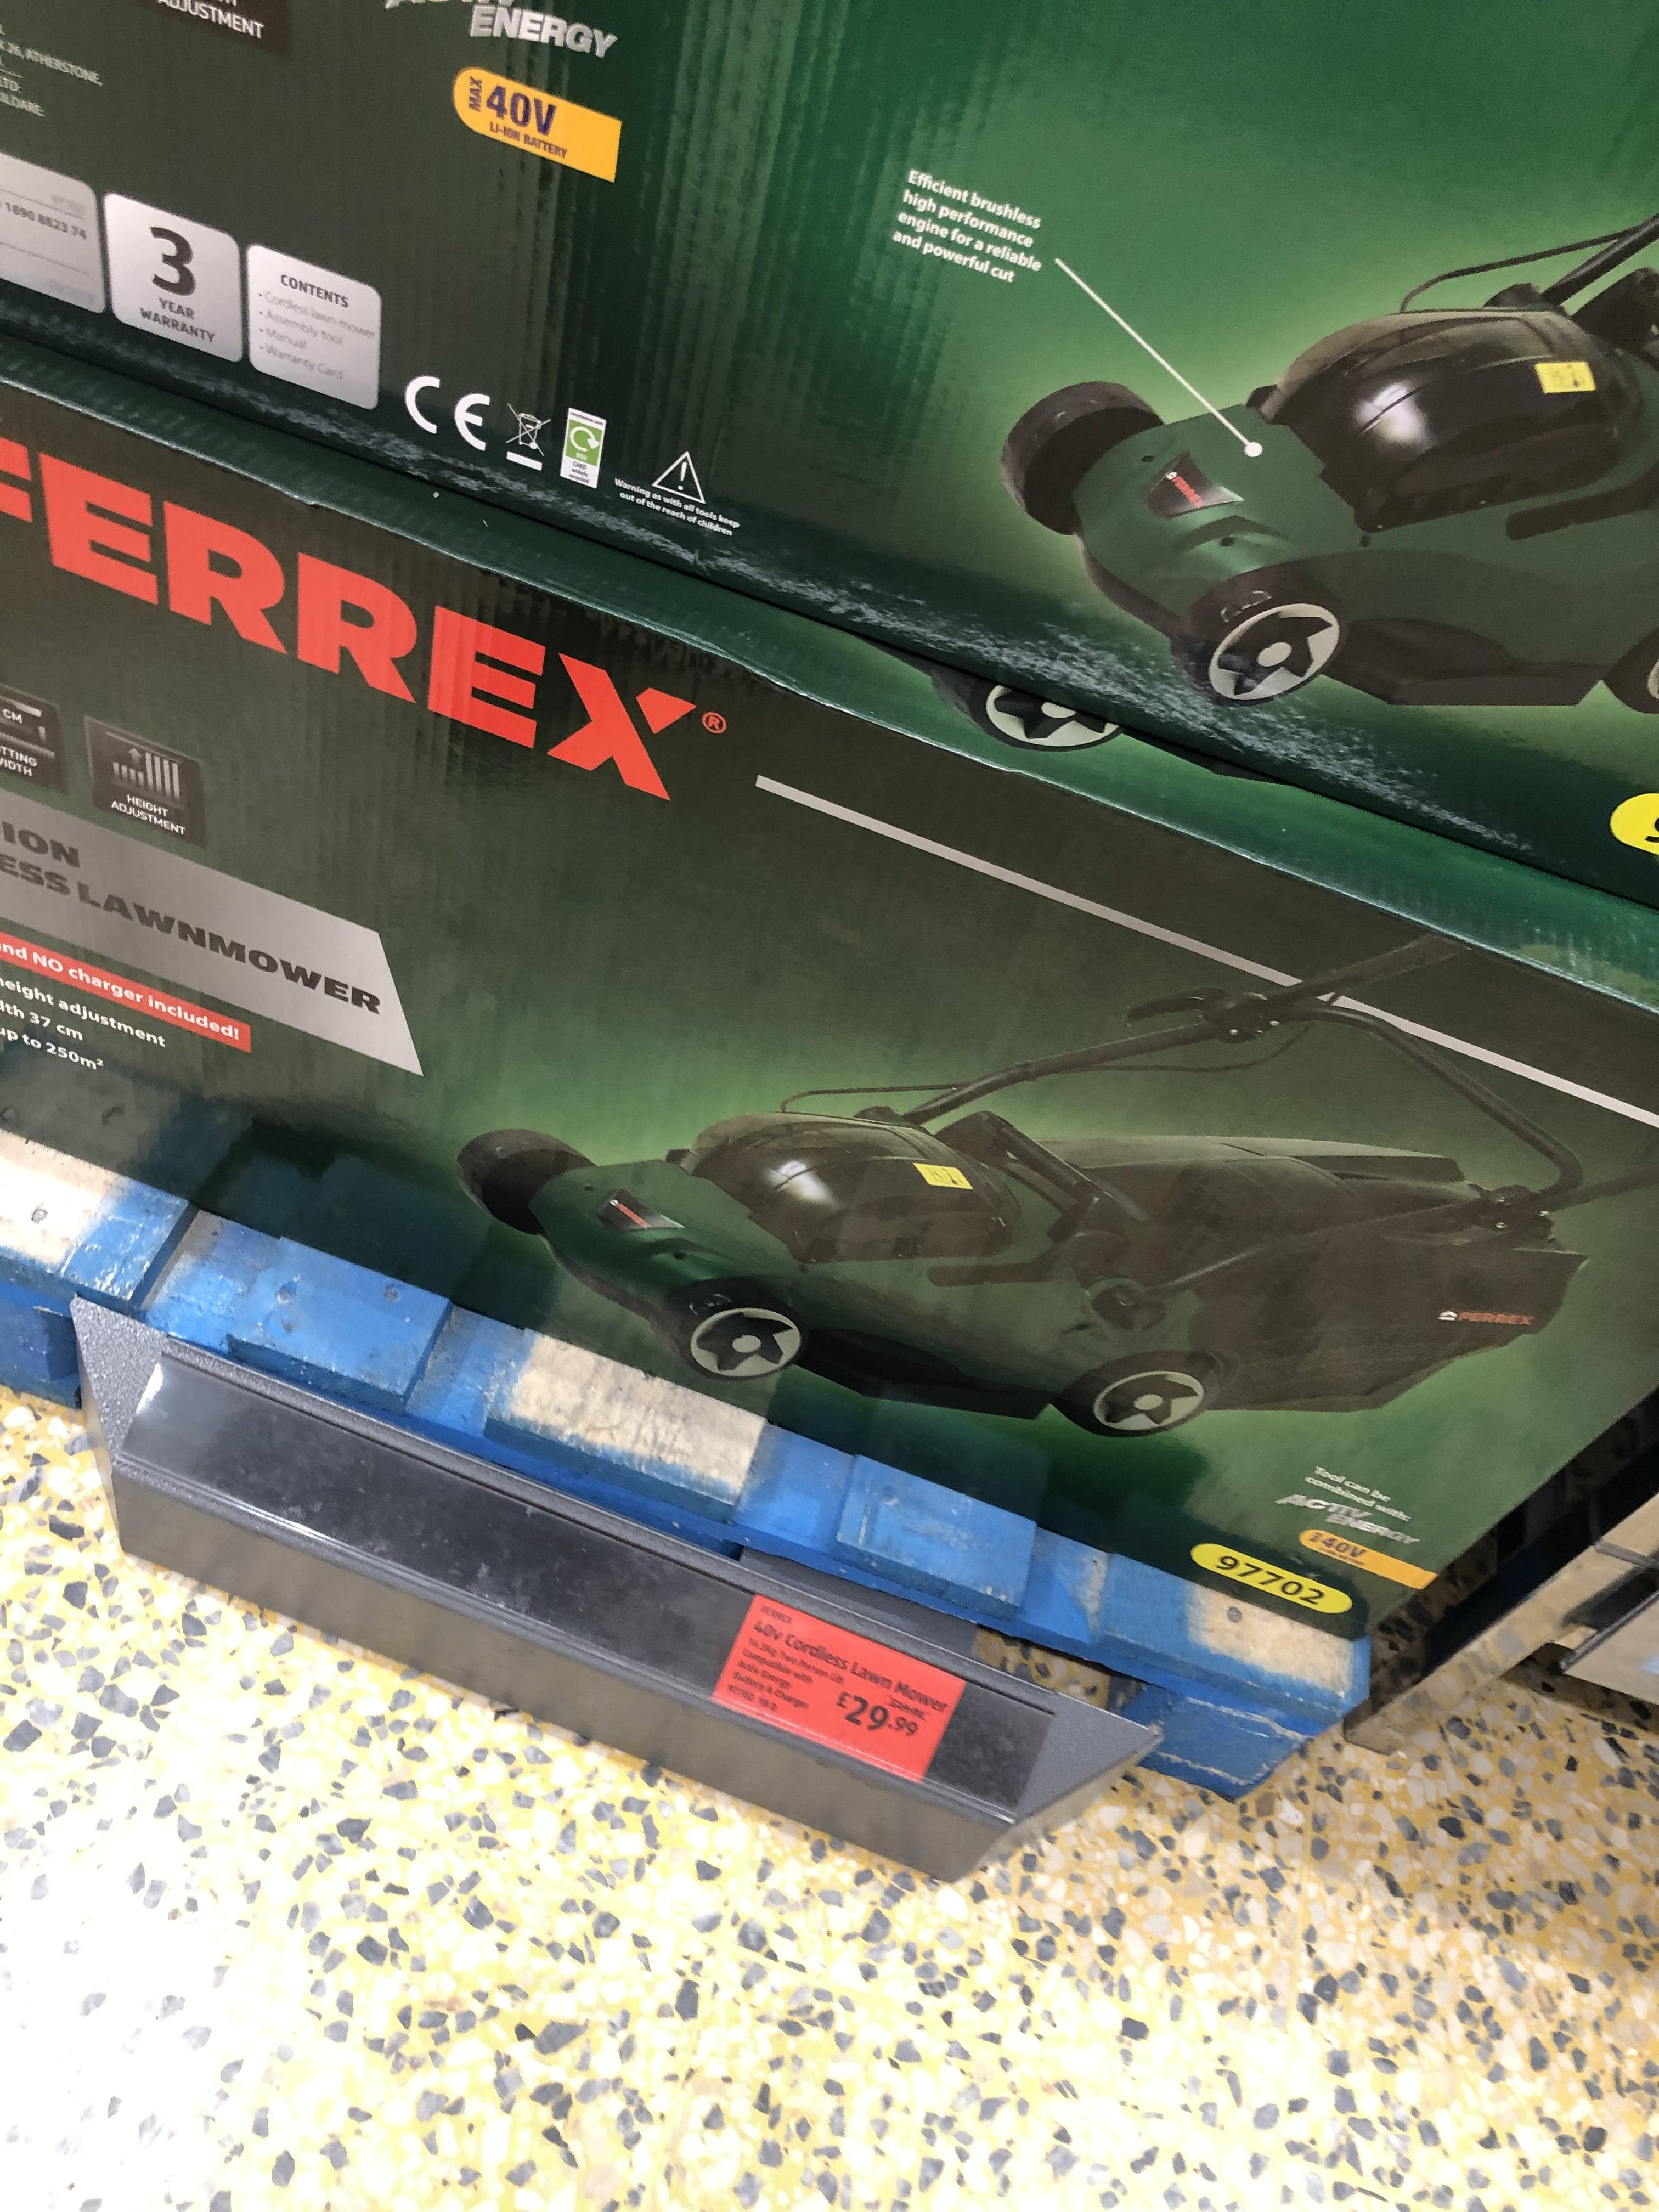 Cordless Lawn Mower £29.99 instore @ Aldi Coulsdon